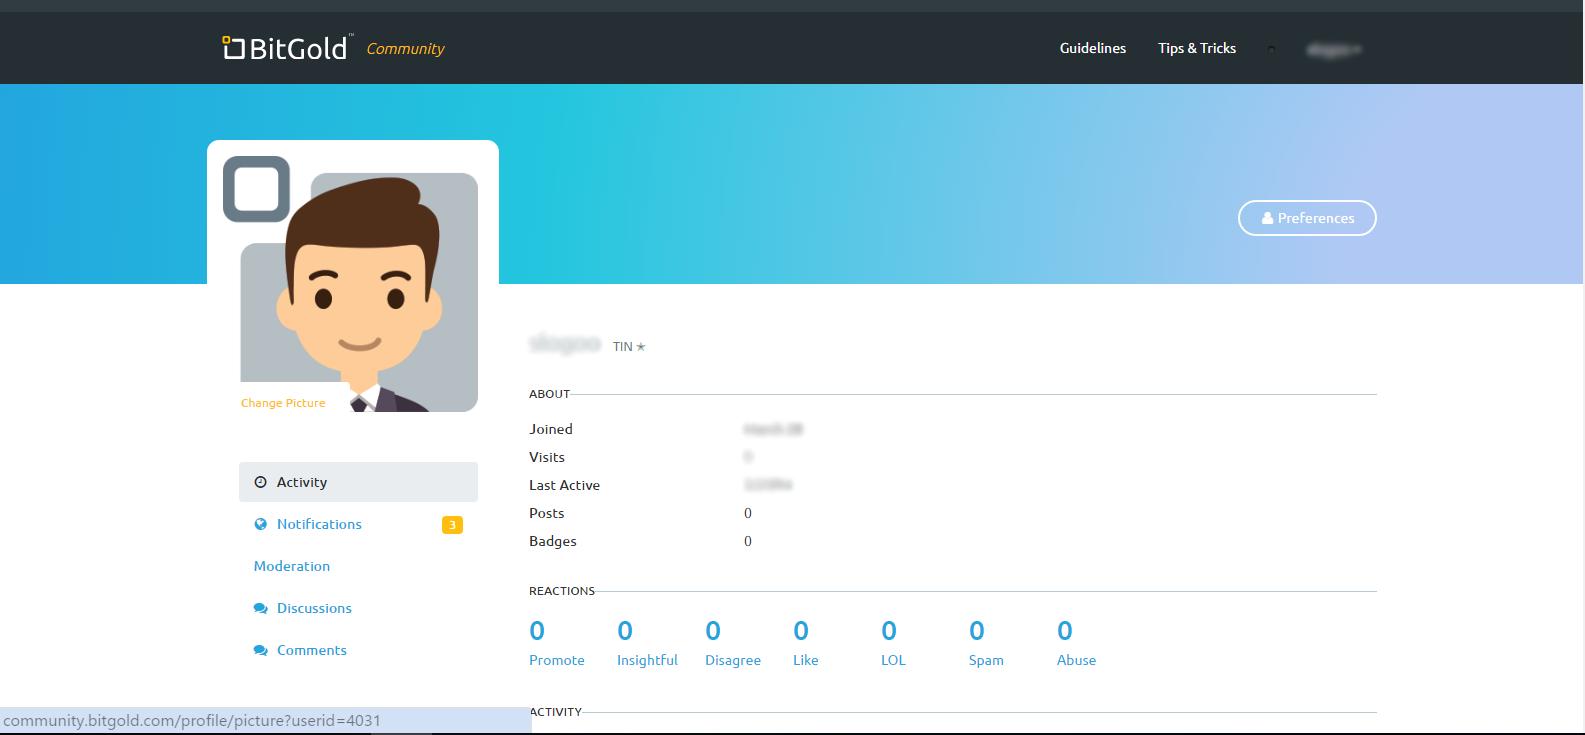 How do I upload an avatar